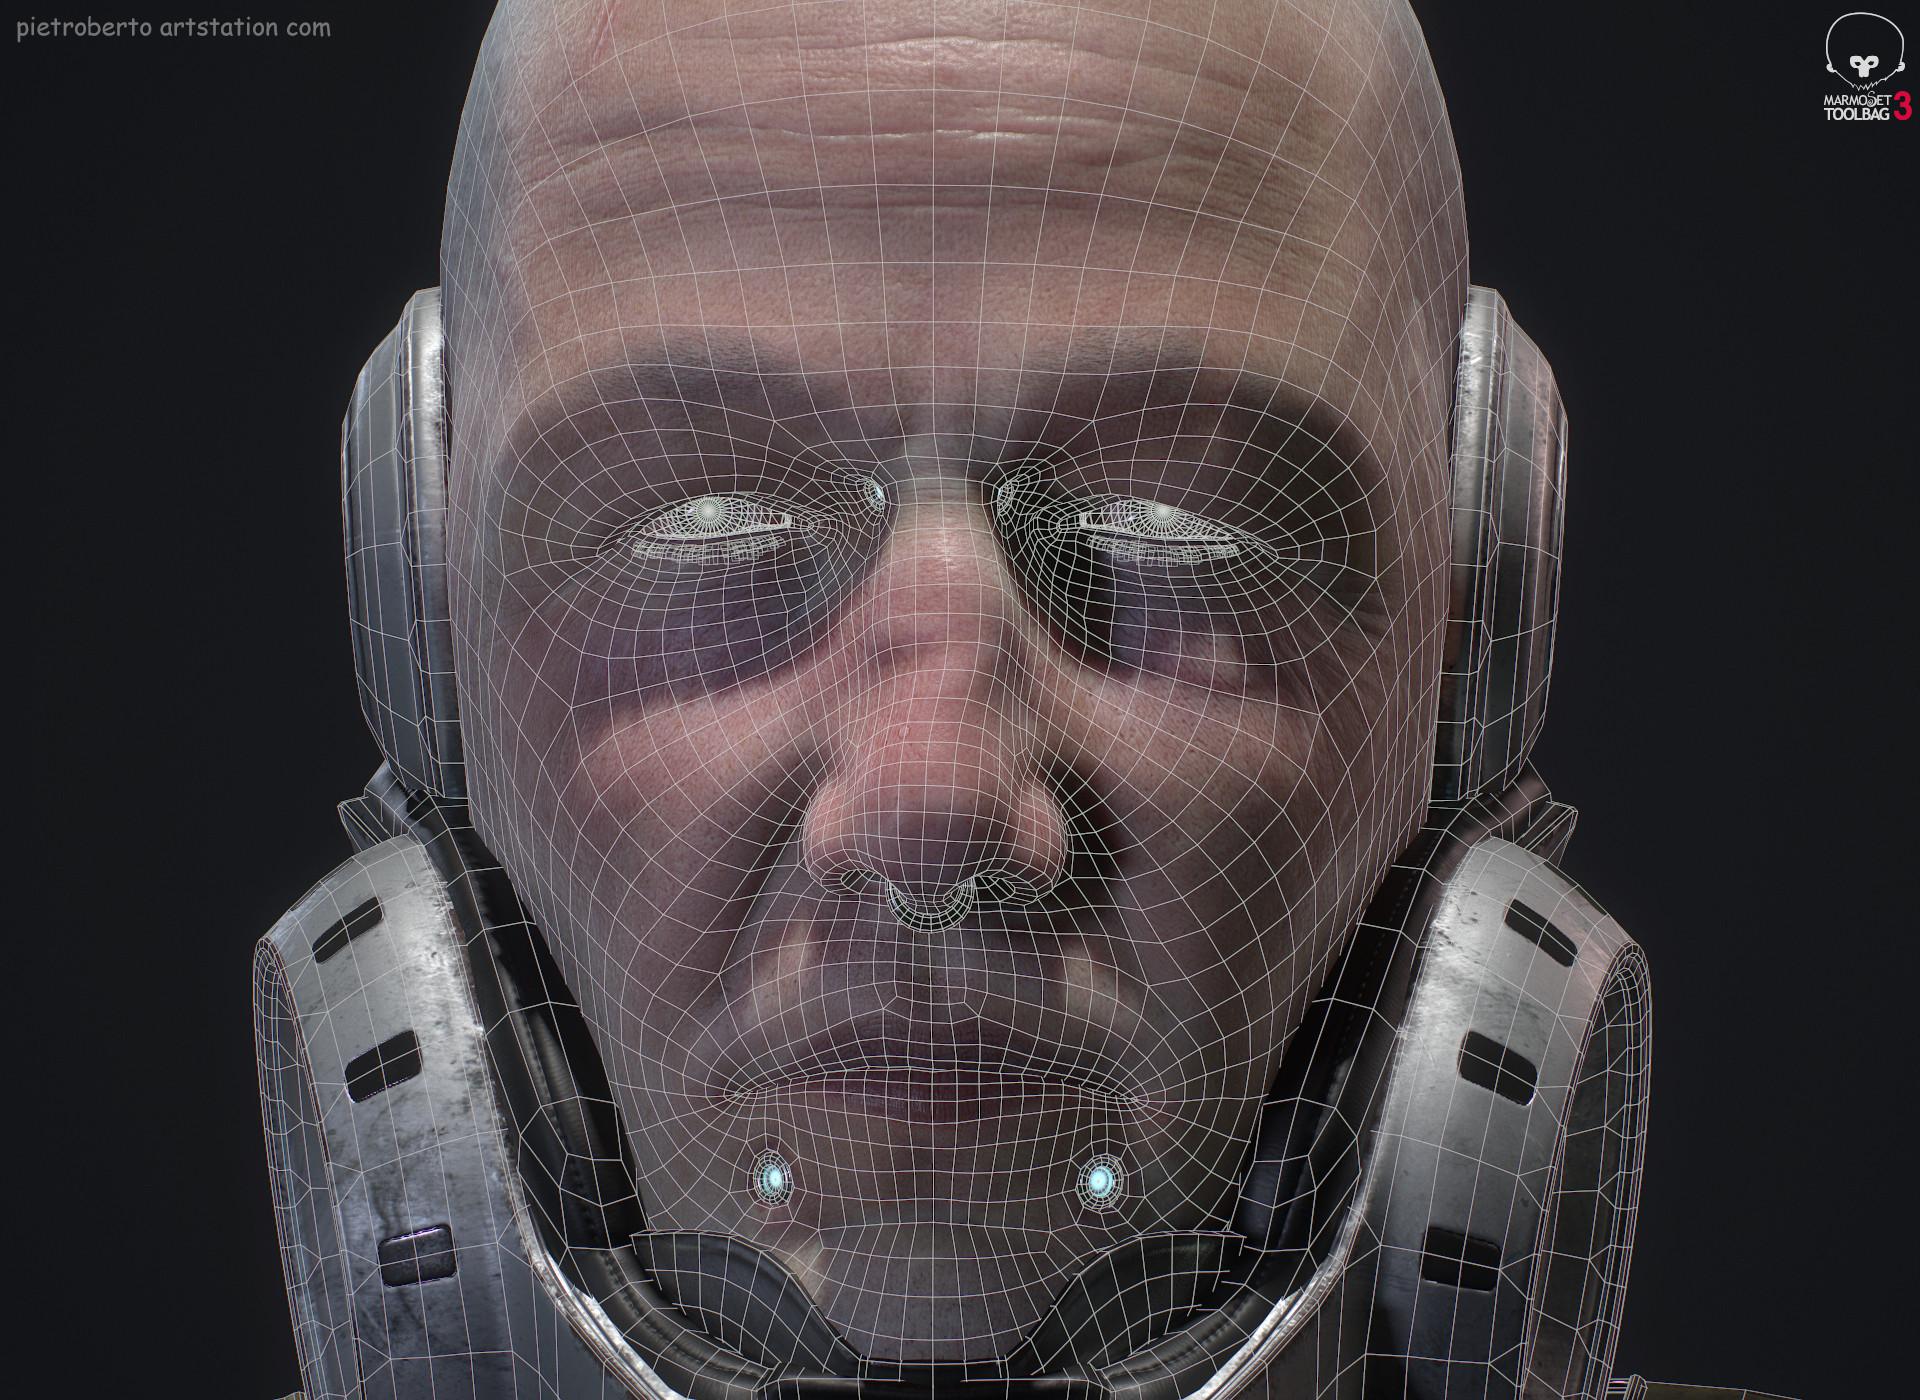 Pietro berto hex wire